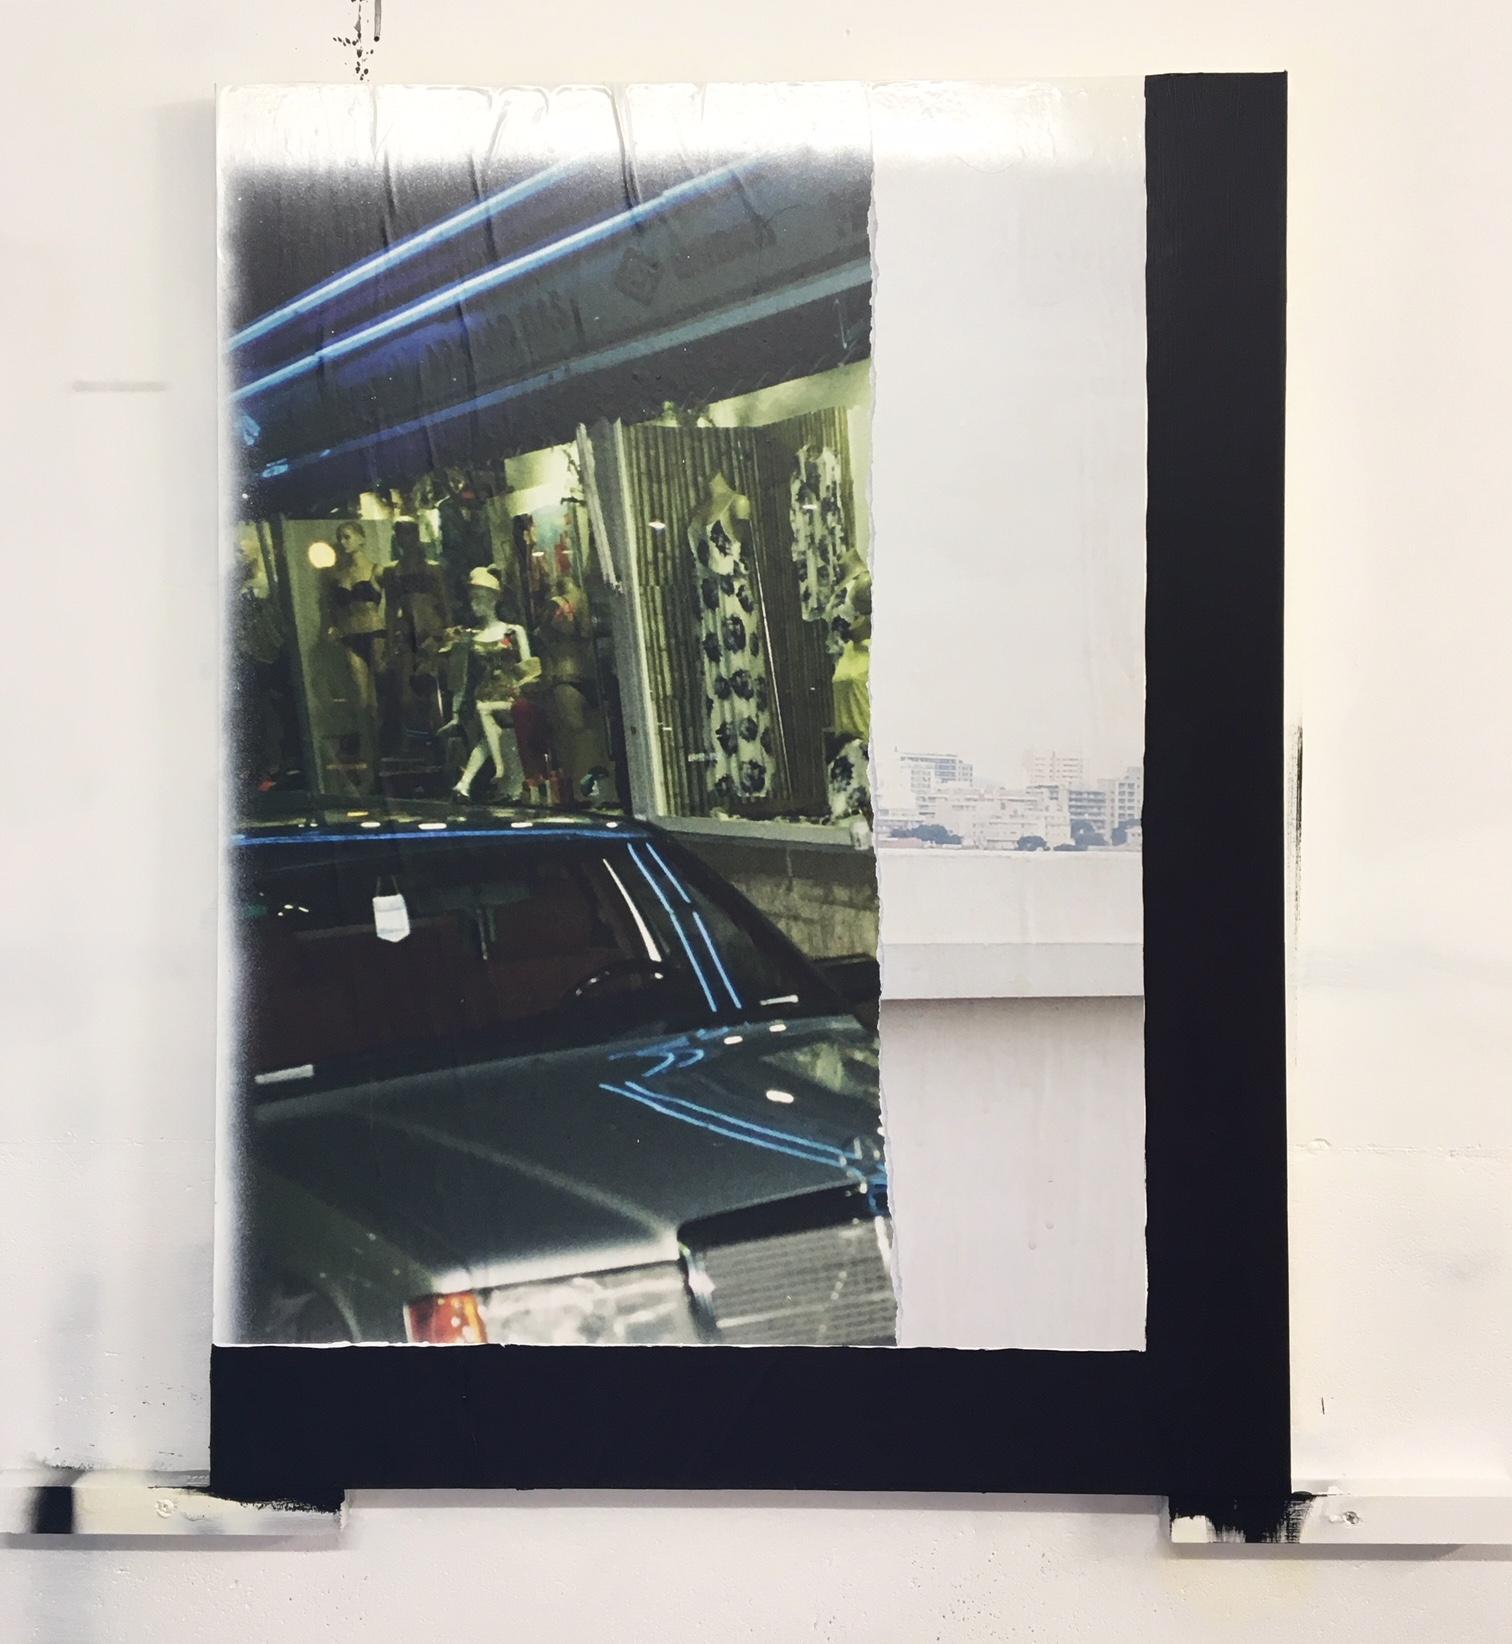 Fragment #7 - Benidorm (ES), Marseille (FR) - 80 x 60 cm Magistra blueback 120 gr., acrylics, wall paste on hard board. 2018 | © MAX KESTELOOT